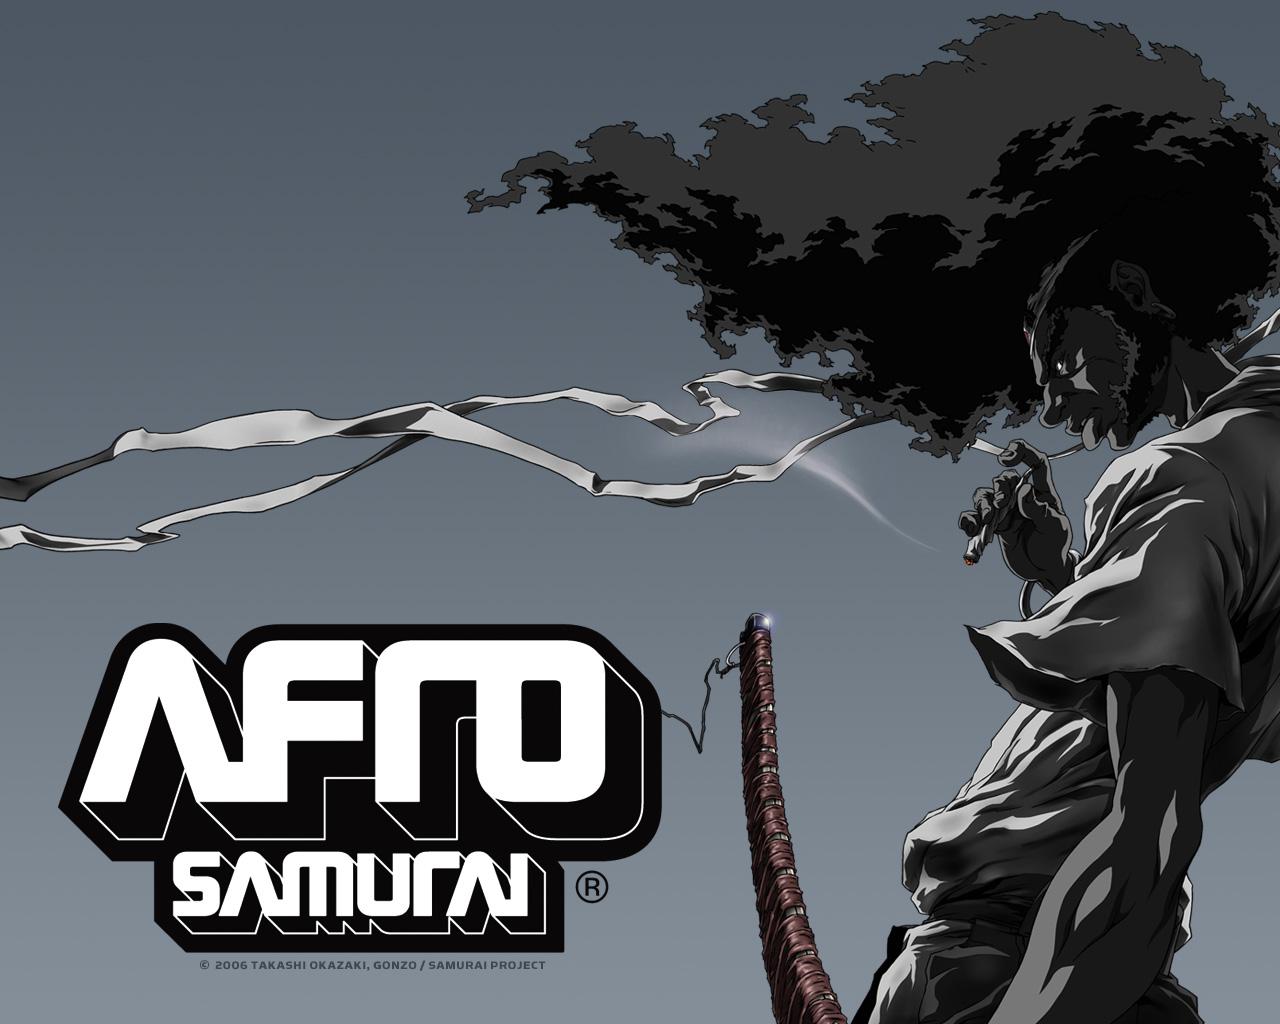 Afro%252BSamurai%252Bwallpapers%2B%2528anime-guardian-zone.blogspot.com%2529.jpg